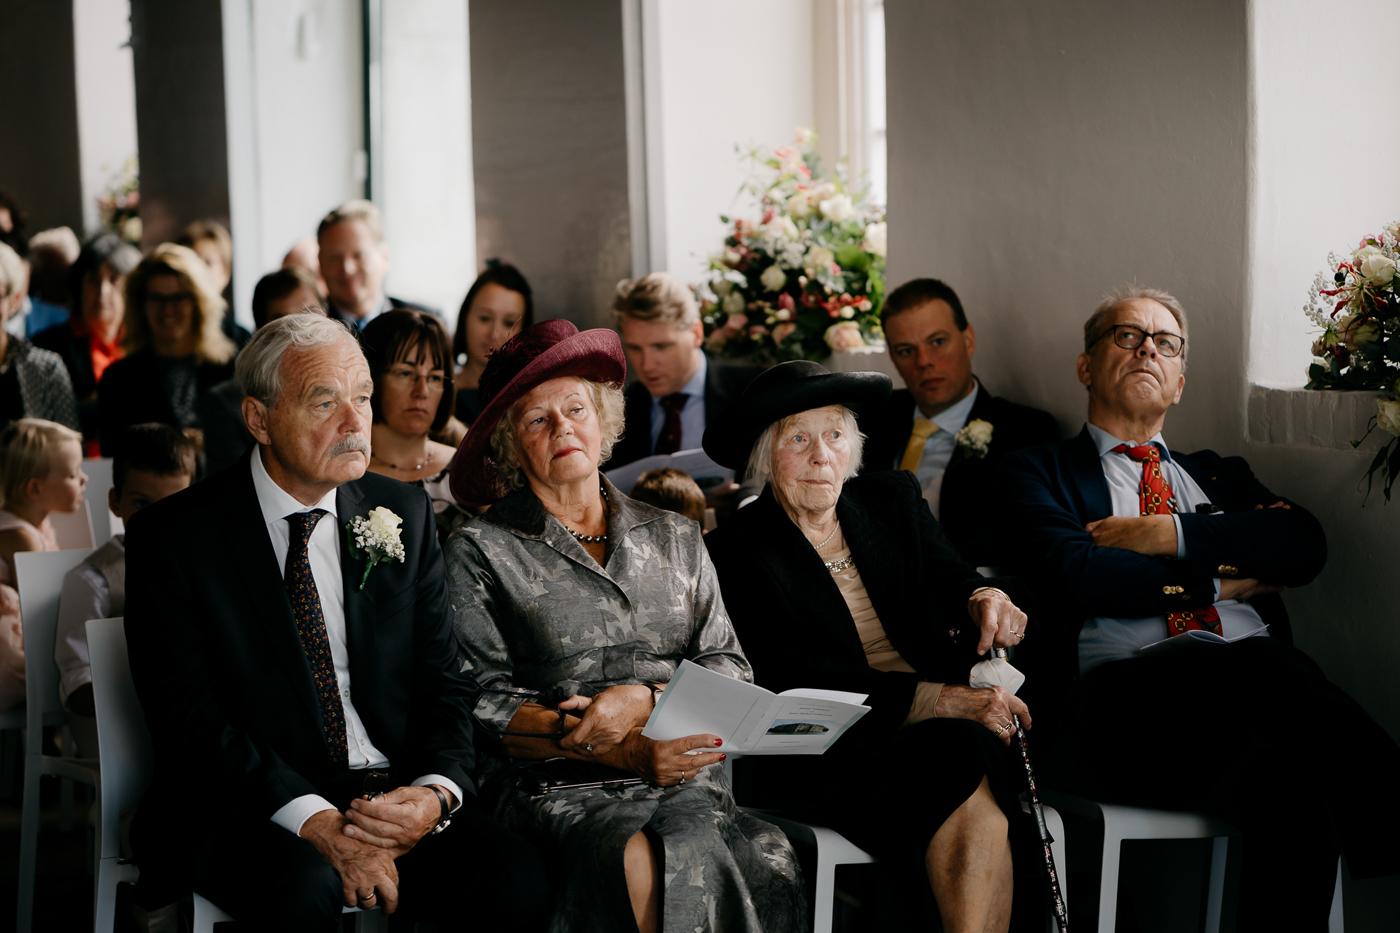 bruidsfotografie-trouwfotograaf-wedding-photographer-amsterdam-James-Jantine-156.jpg